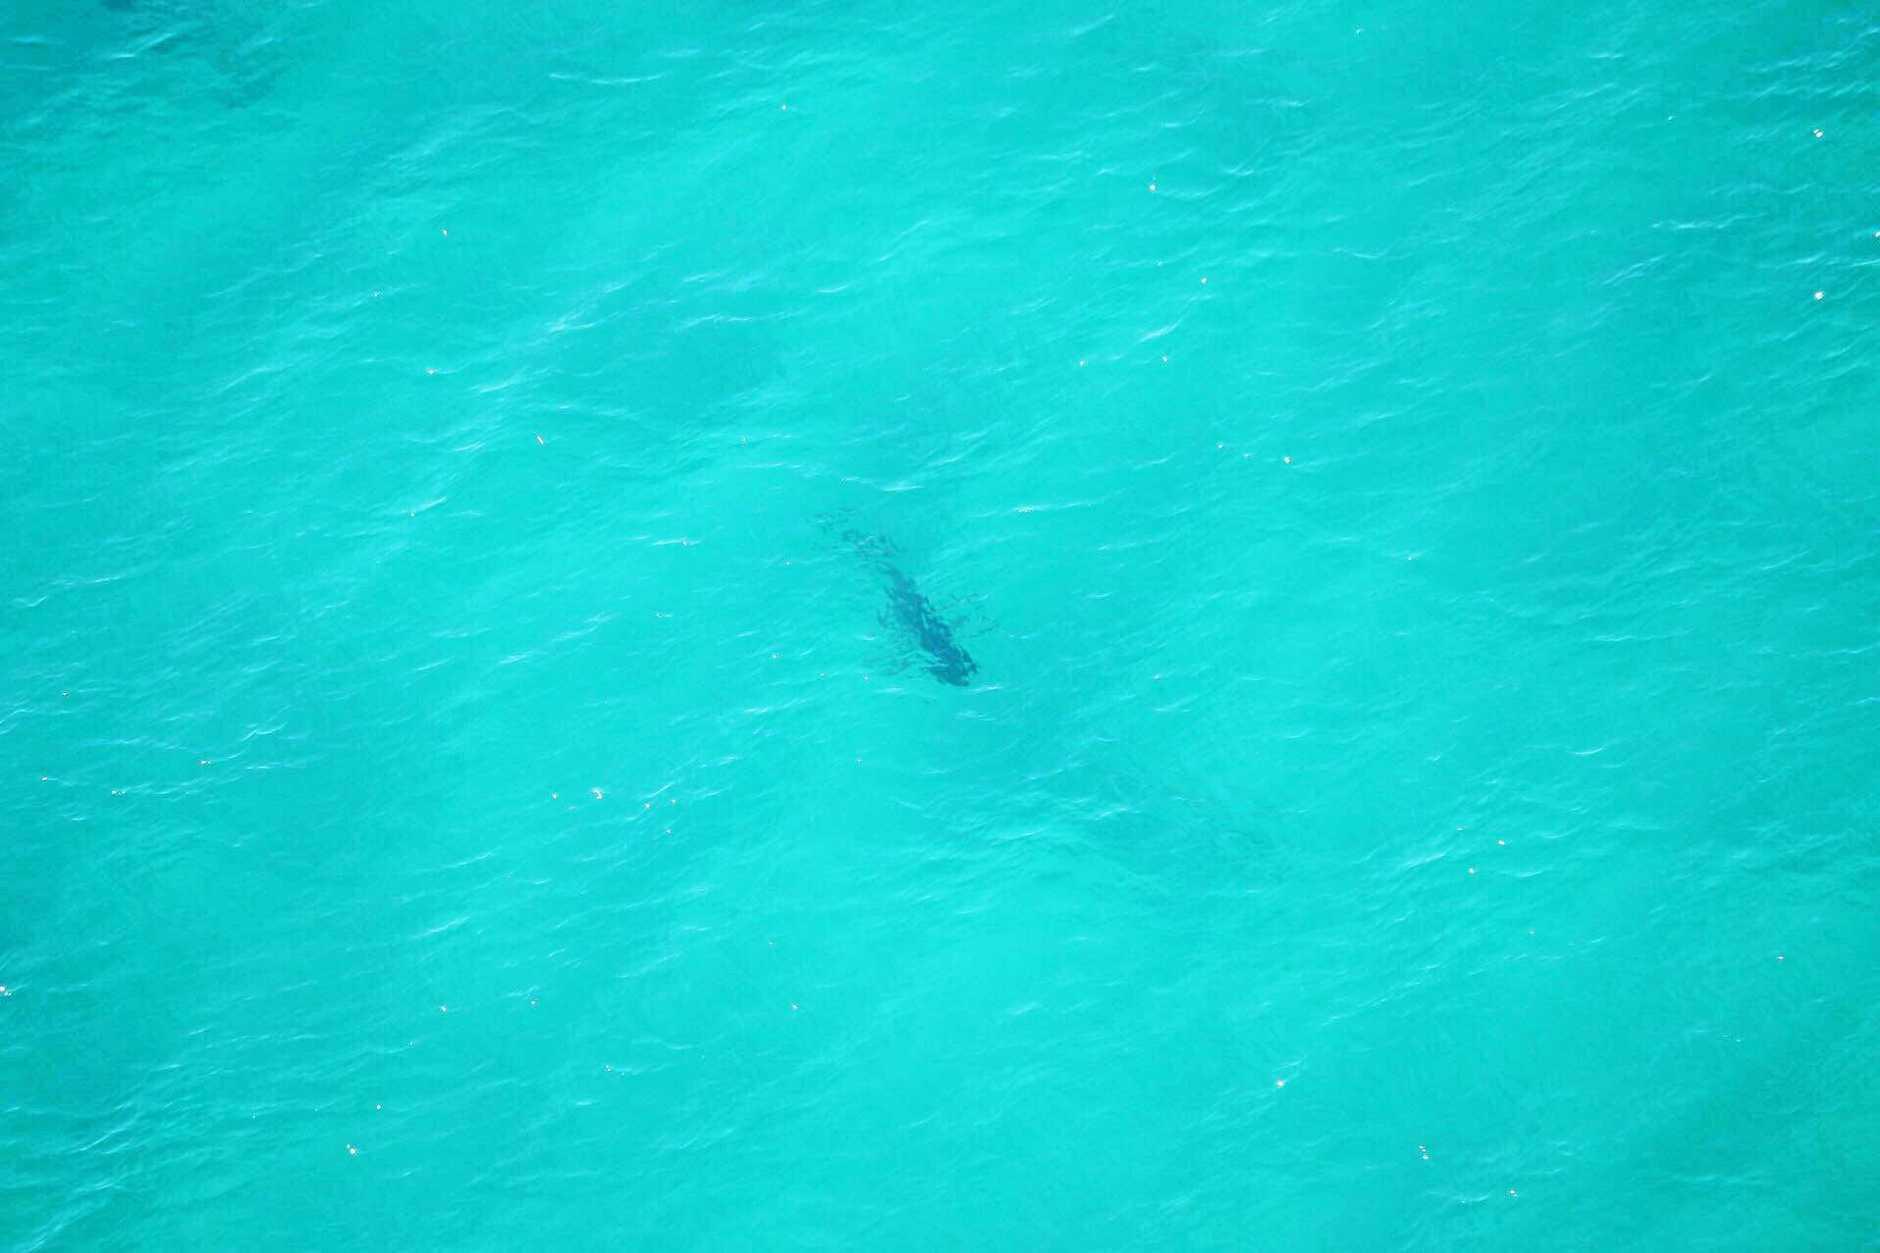 White shark spotted at Boambee Headland.